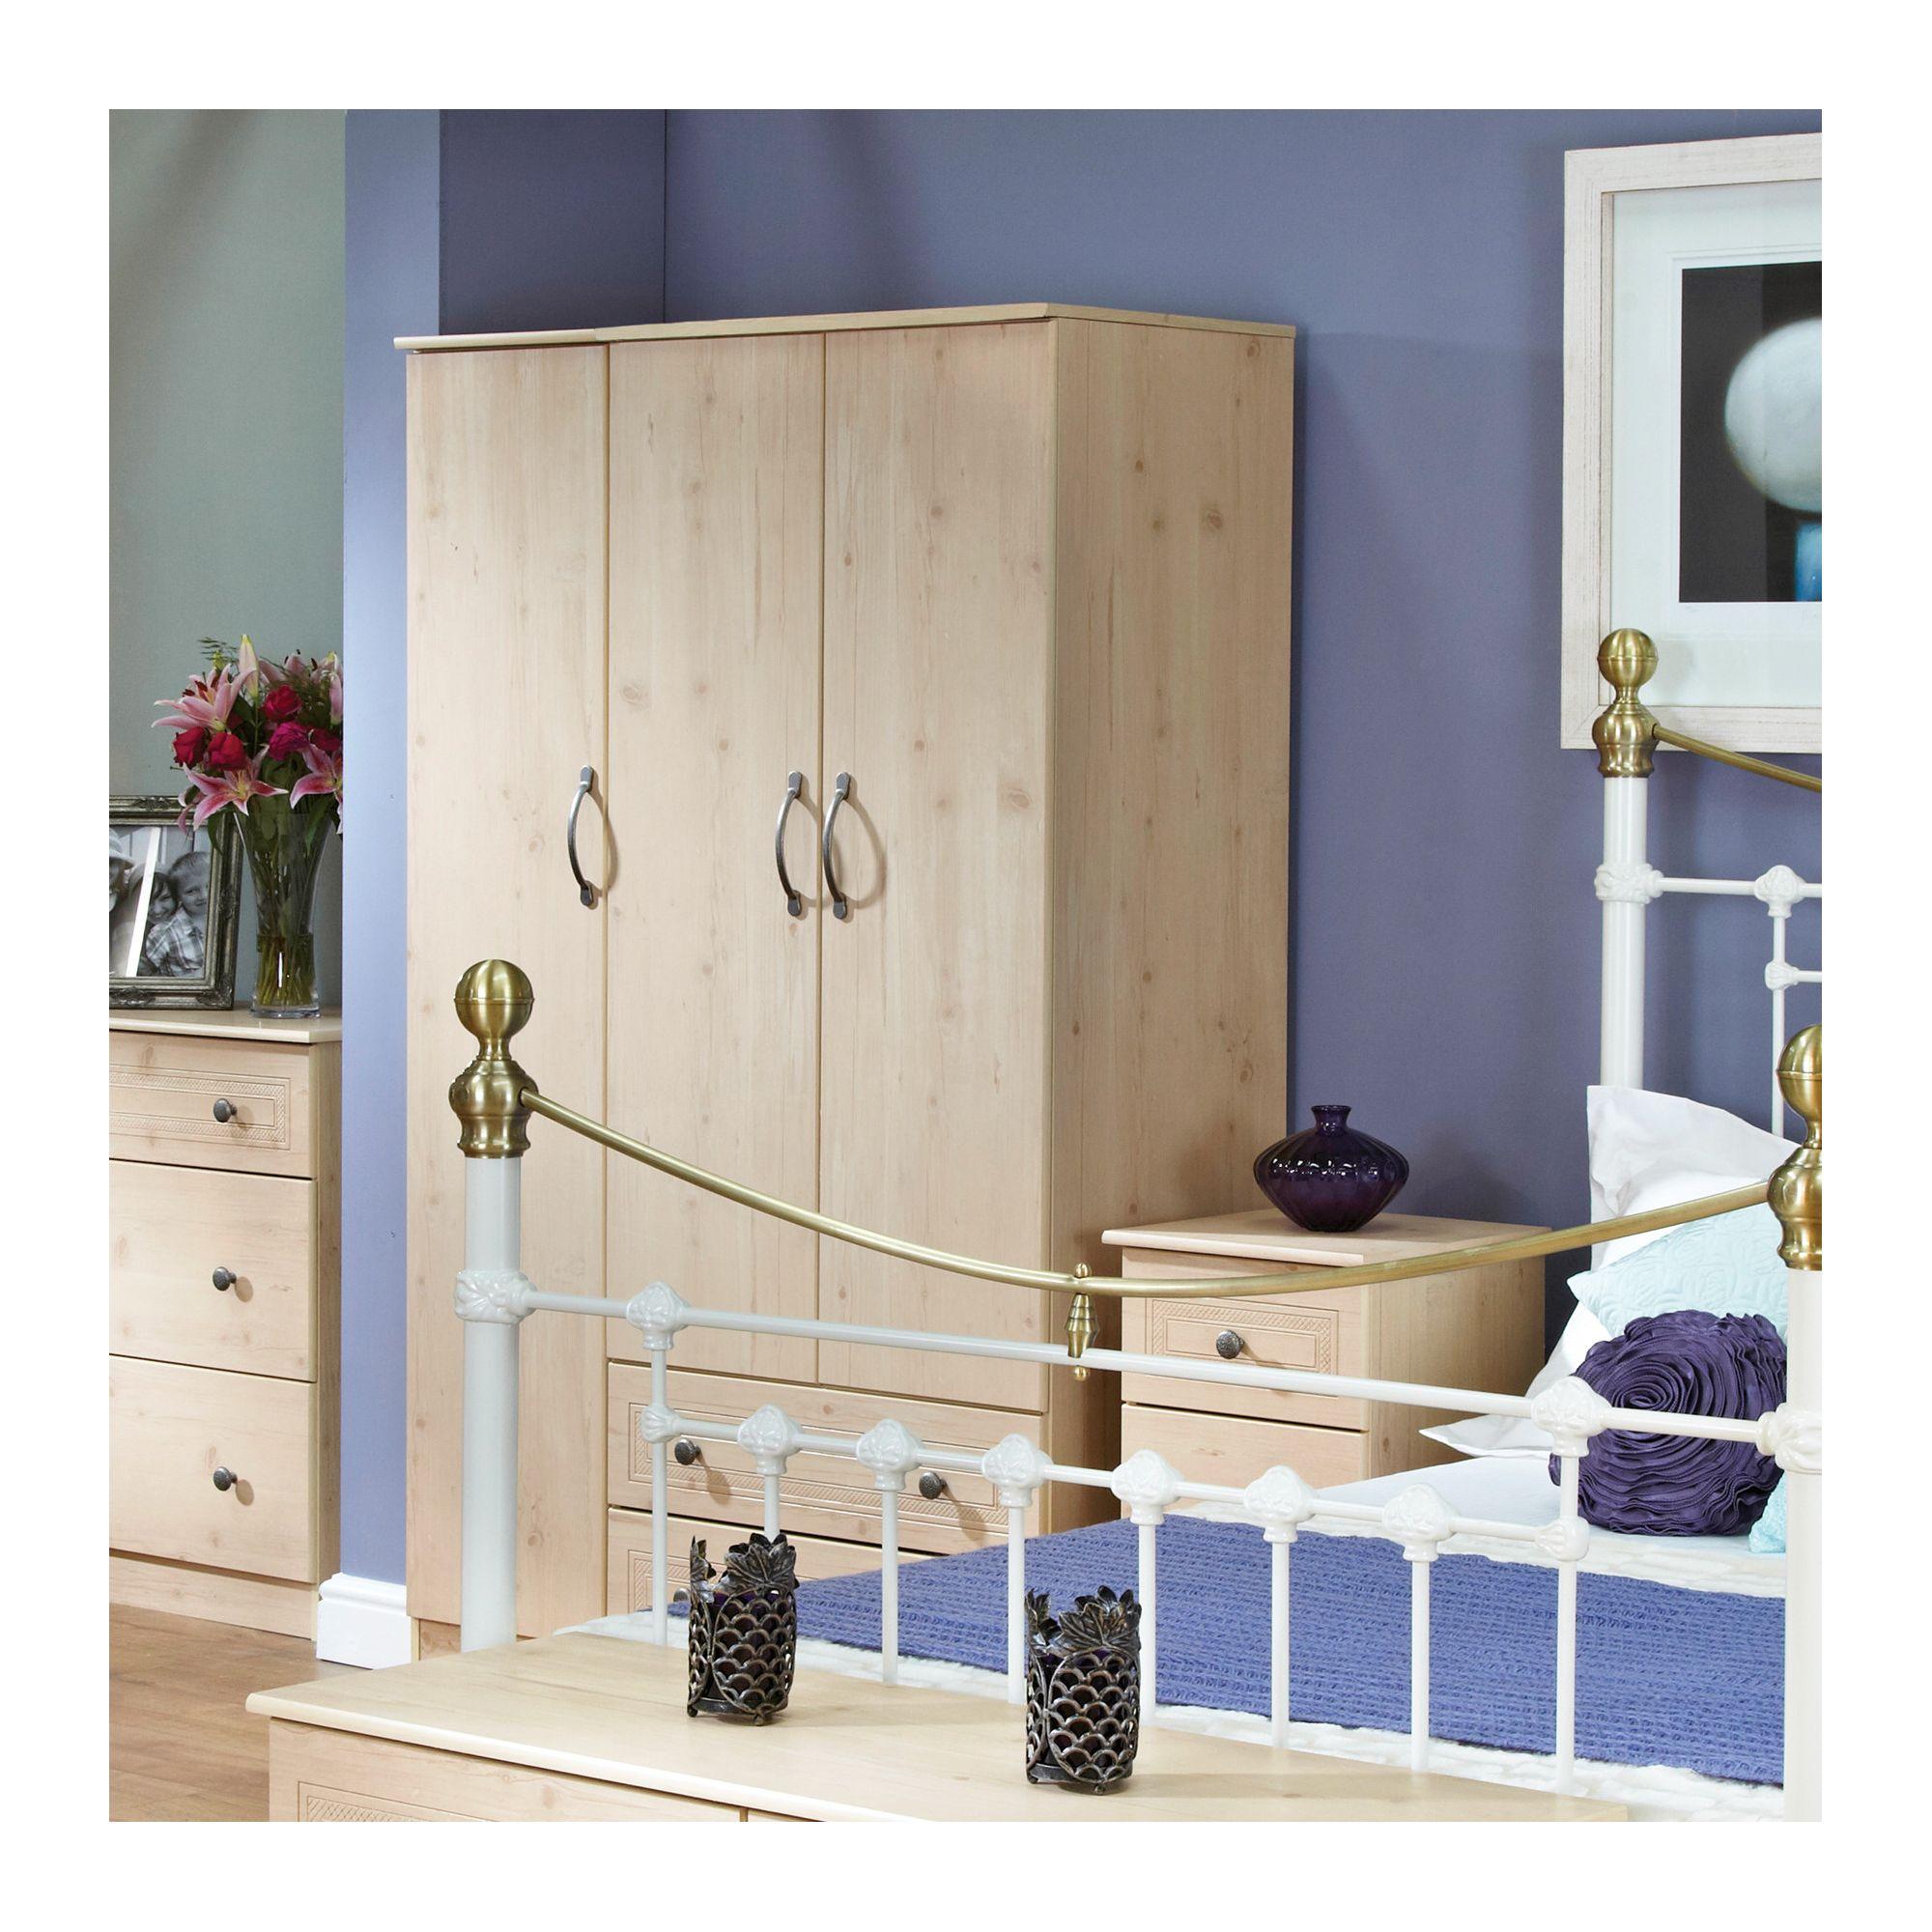 Welcome Furniture Florida 2 Drawer Wardrobe - 197cm H x 74cm W at Tesco Direct